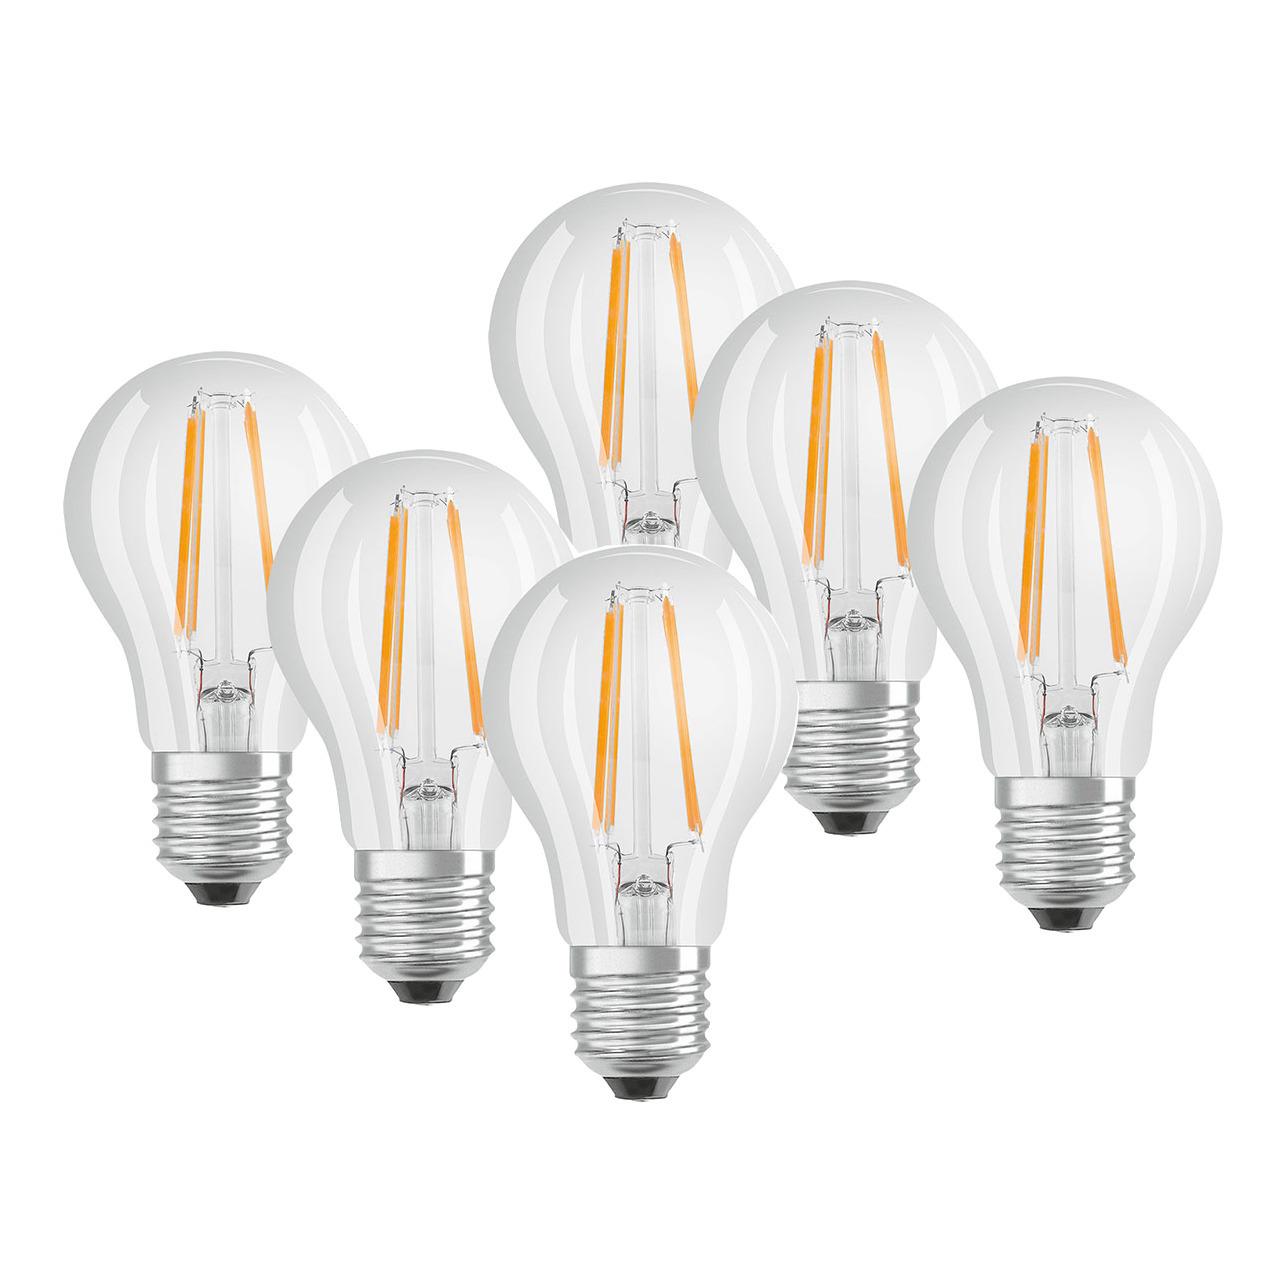 OSRAM 6er Set 7-W-Filament-LED-Lampe E27- warmweiss- klar